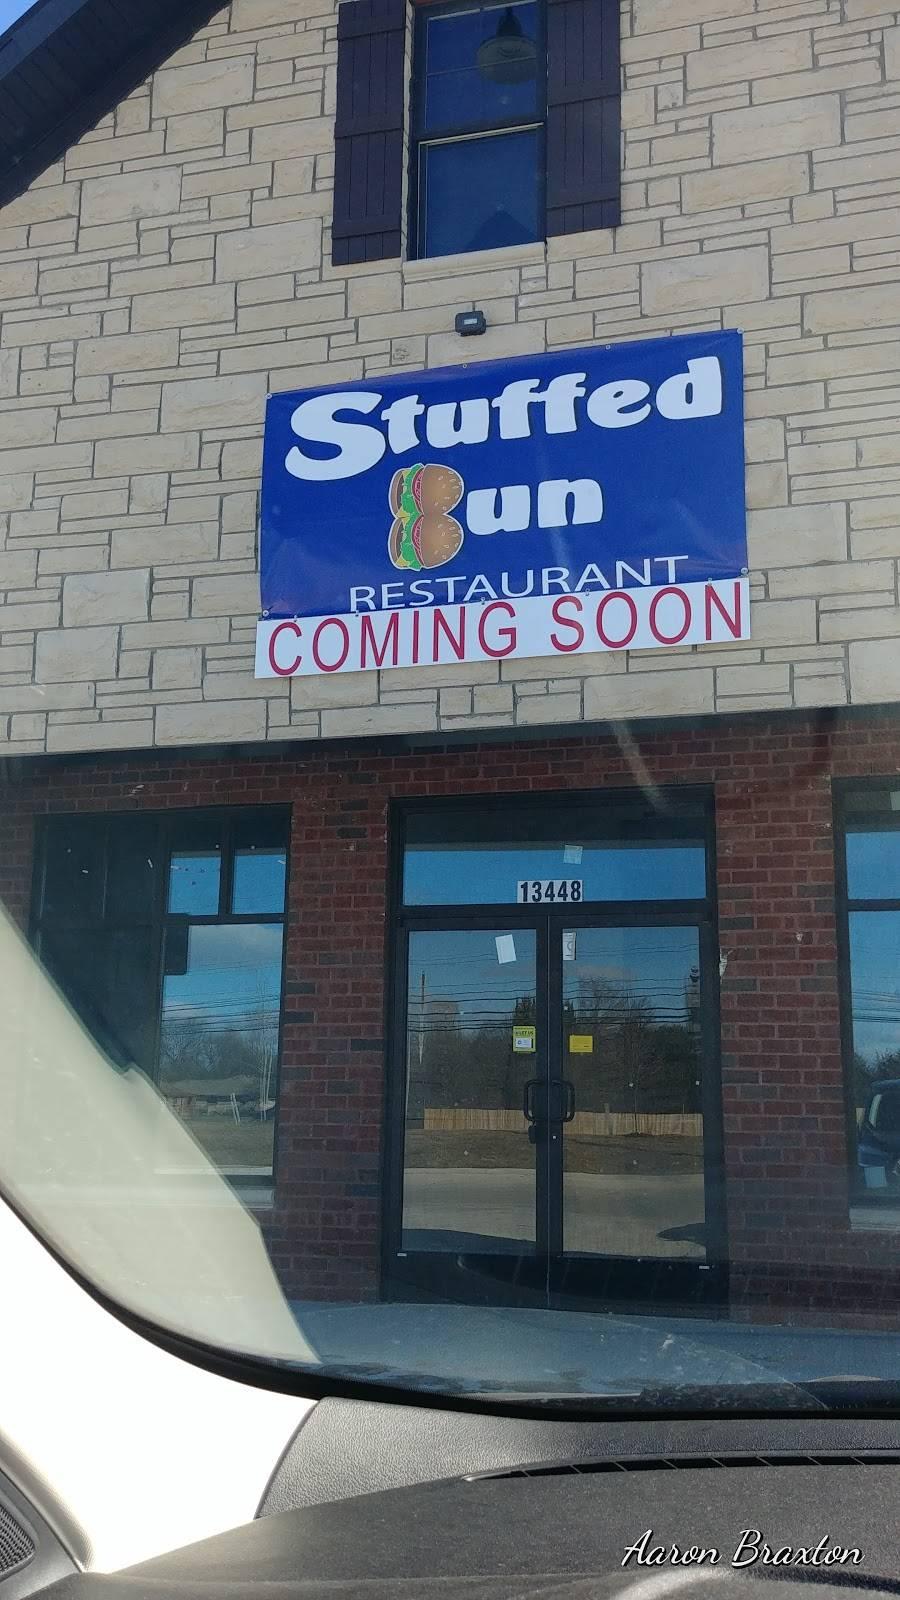 Stuffed Bun Restaurant | restaurant | 13448 24 Mile Rd, Shelby Charter Twp, MI 48315, USA